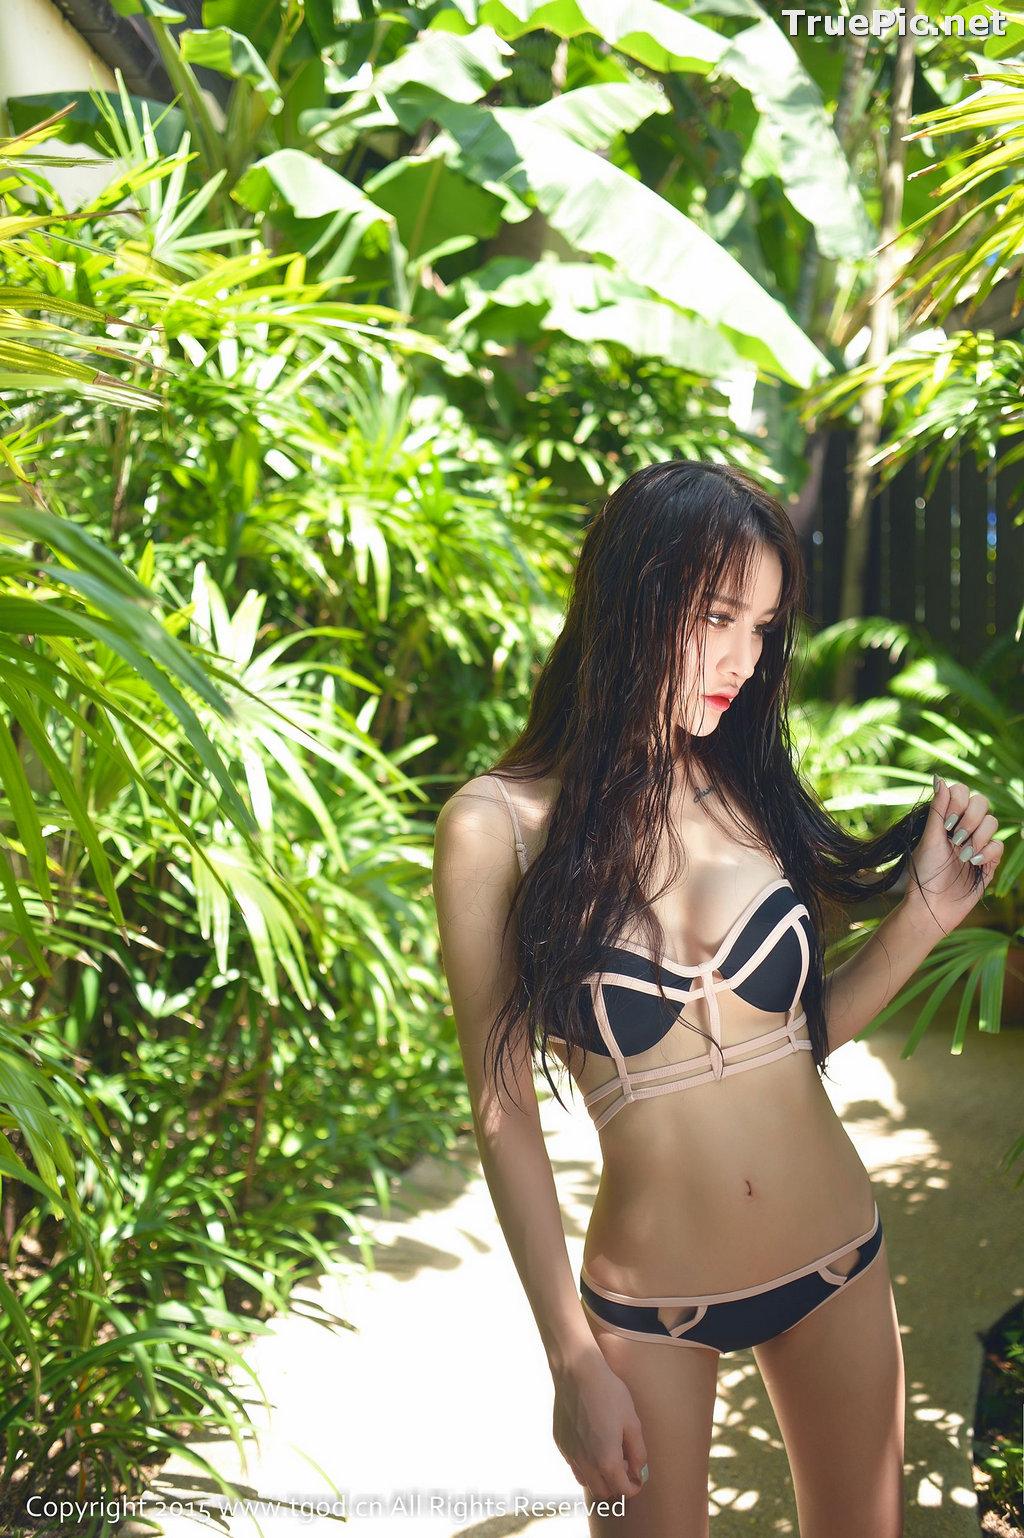 Image TGOD 2015-11-10 - Chinese Sexy Model - Cheryl (青树) - TruePic.net - Picture-27